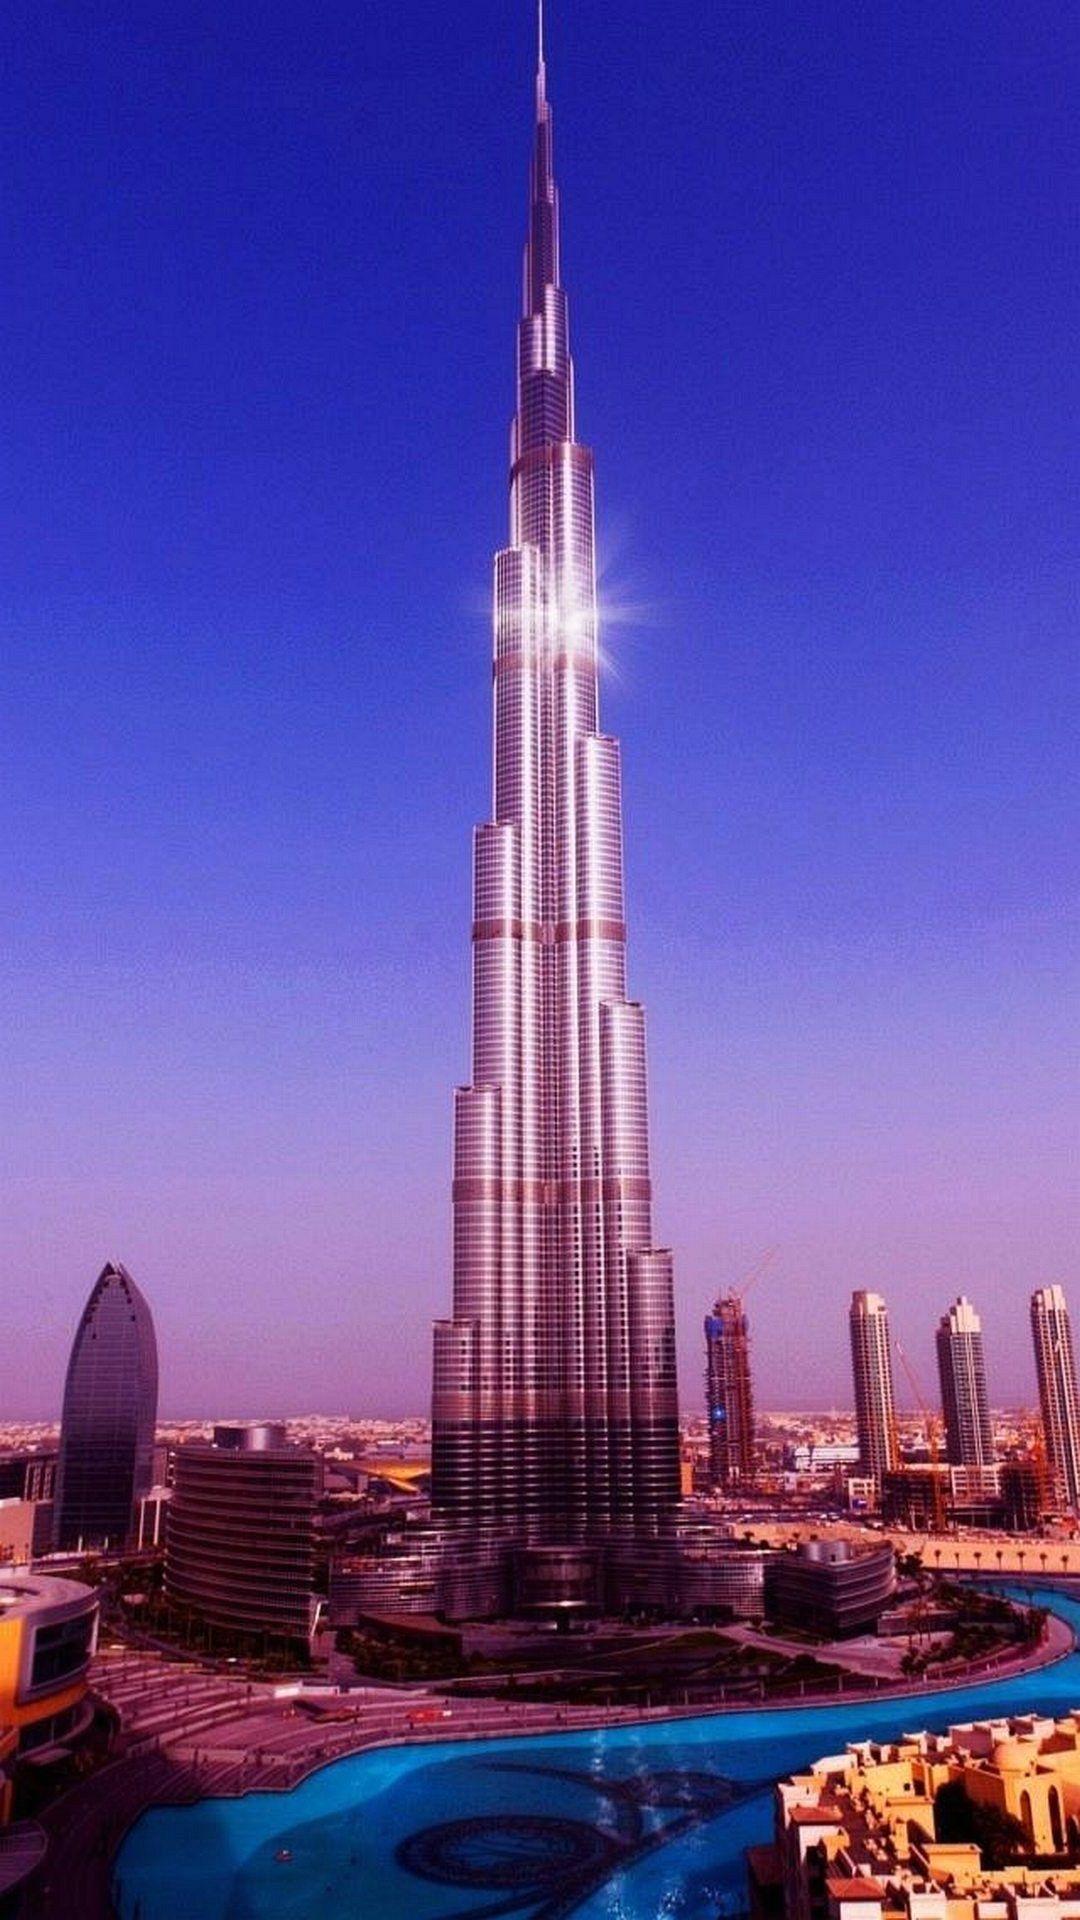 Burj Khalifa Dubai Wallpaper iPhone | iPhoneWallpapers | Burj khalifa, Iphone wallpaper, Best ...